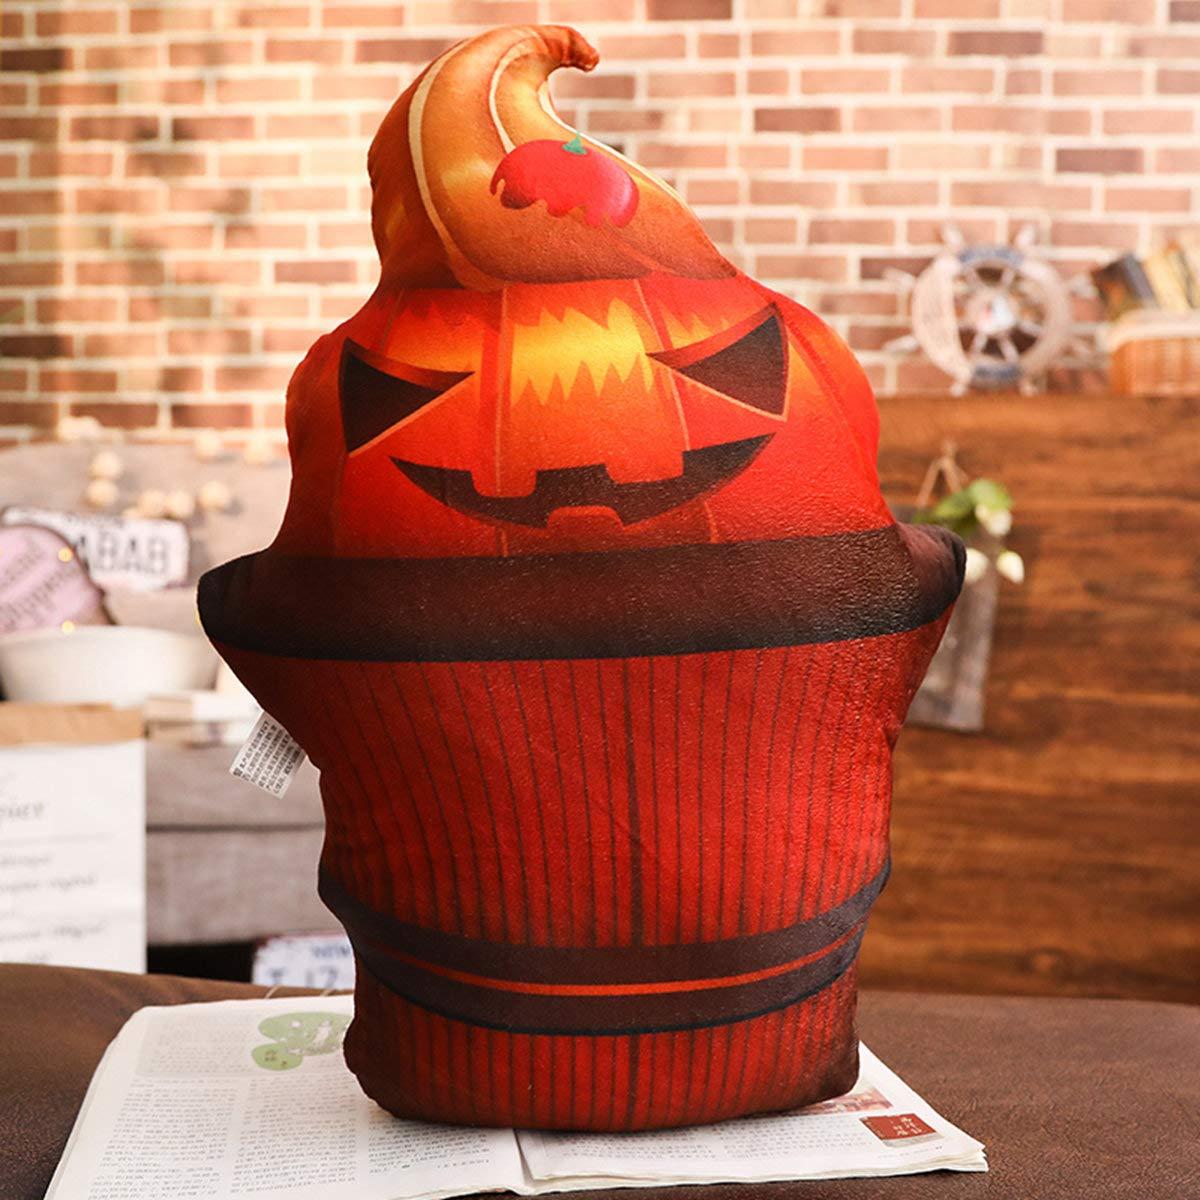 3D Cherry Cake Pumpkin About 45 centimeters ( Yancyong Three-Dimensional Printing Halloween Pumpkin Head Pillow,3D Cherry Cake Pumpkin About 45 Centimeters (See Description Chart For Details)